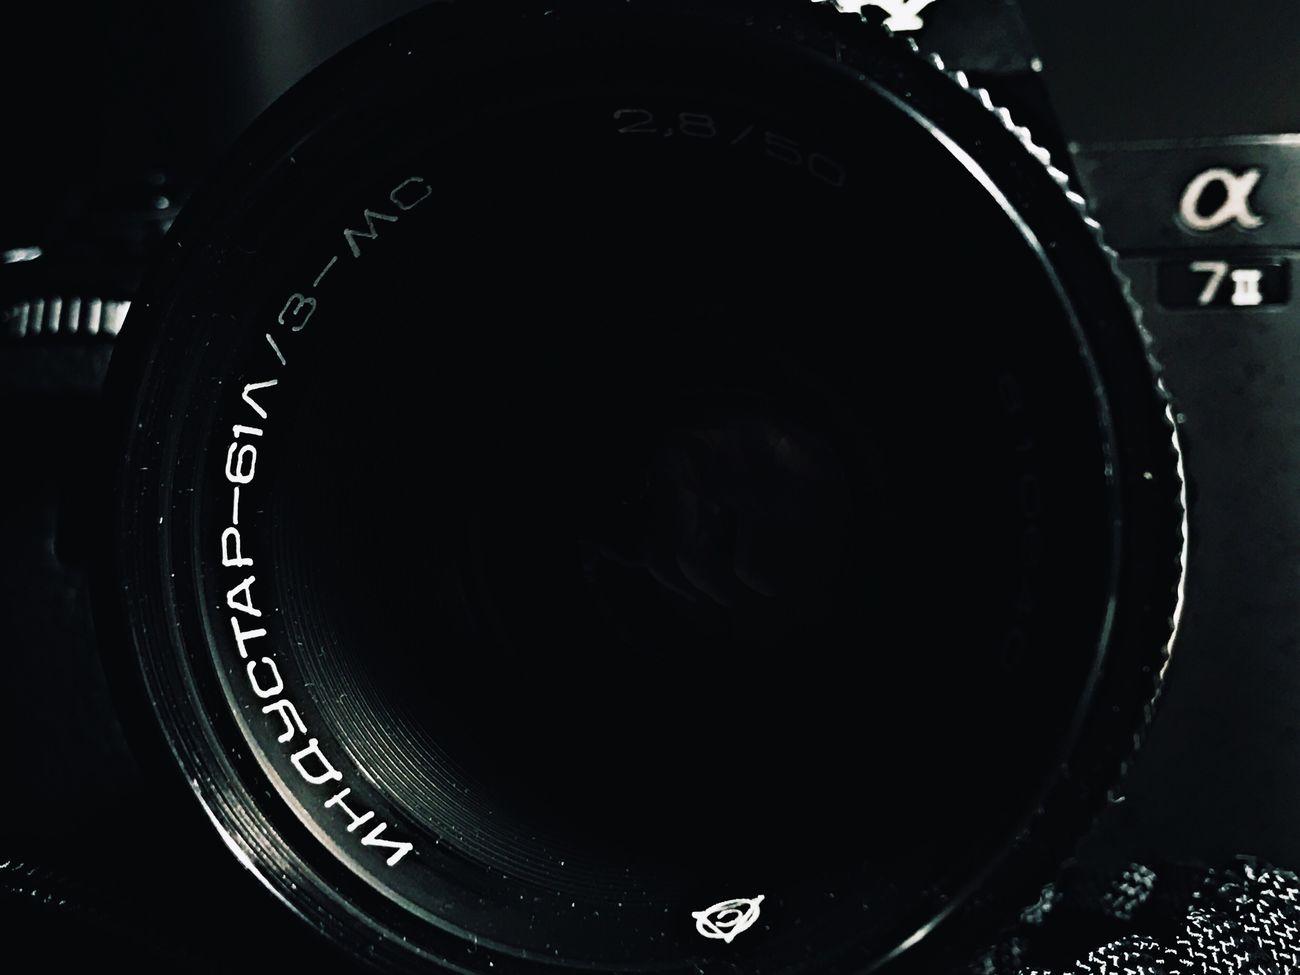 Camera - Photographic Equipment Technology INDUSTAR-61 L/Z MC 50mm F2.8 Photography 7plus SONY A7ii Sonyalpha